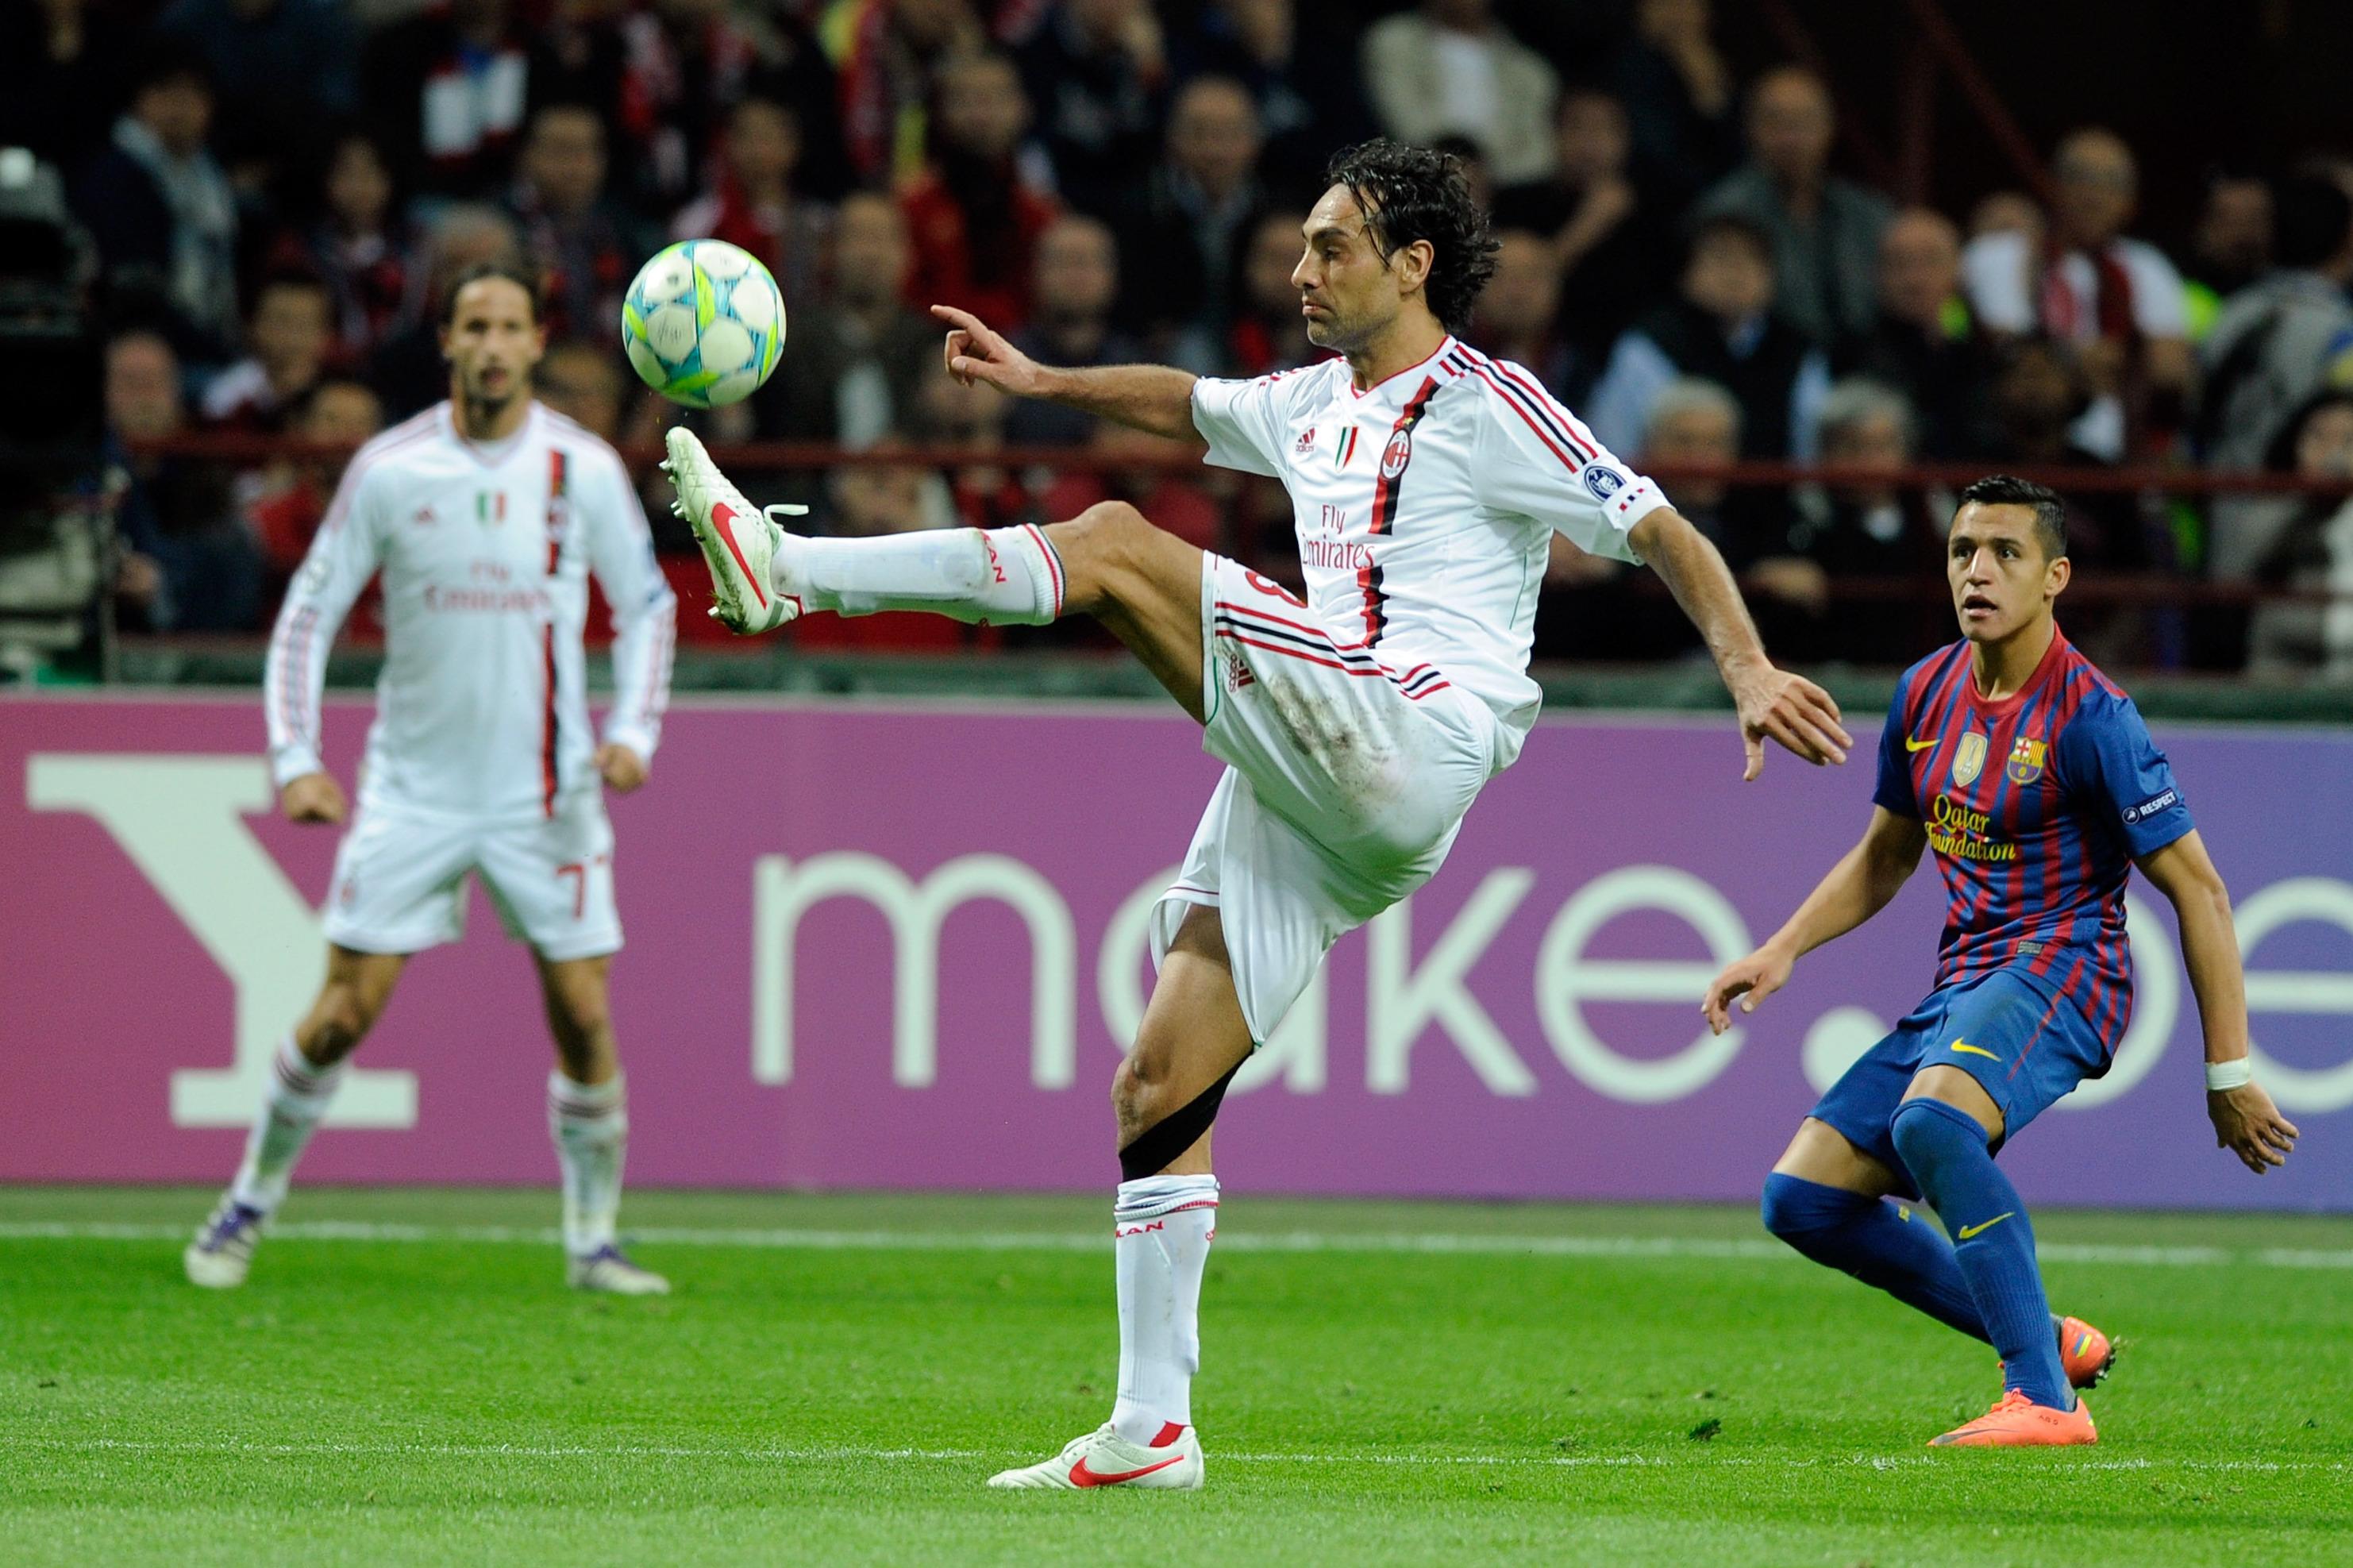 Fc Barcelona Vs Ac Milan 2012 Uefa Champions League Quarter Final Preview Bleacher Report Latest News Videos And Highlights